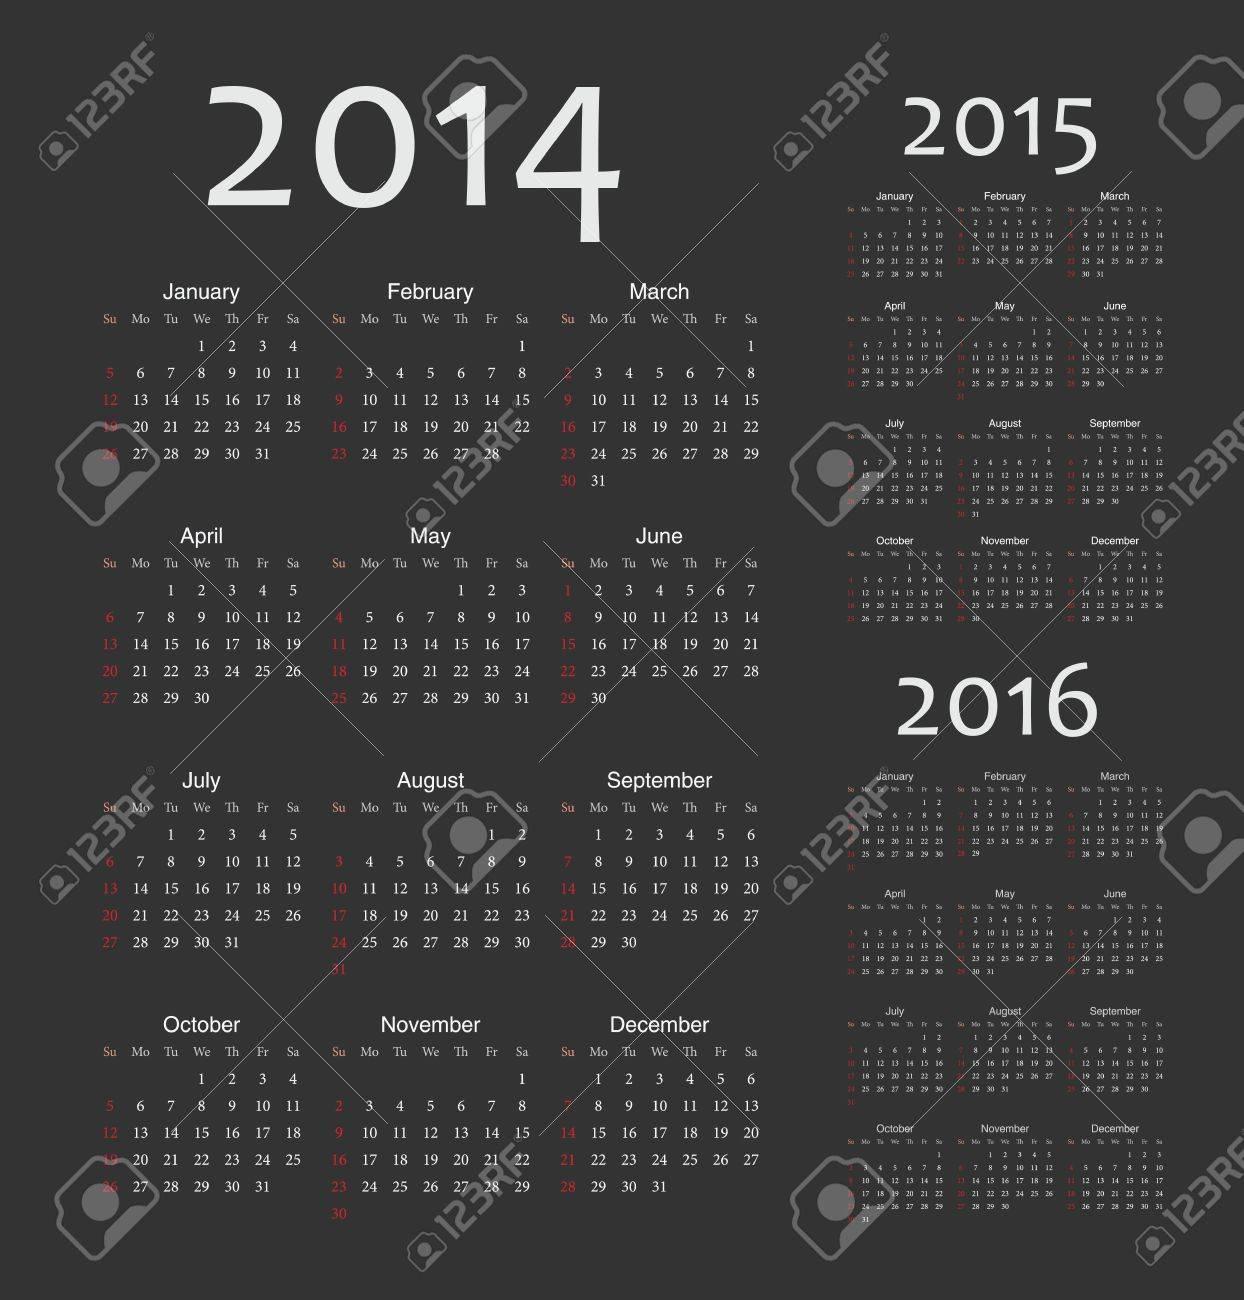 Simple european 2014, 2015, 2016 year  calendars Stock Vector - 19320211